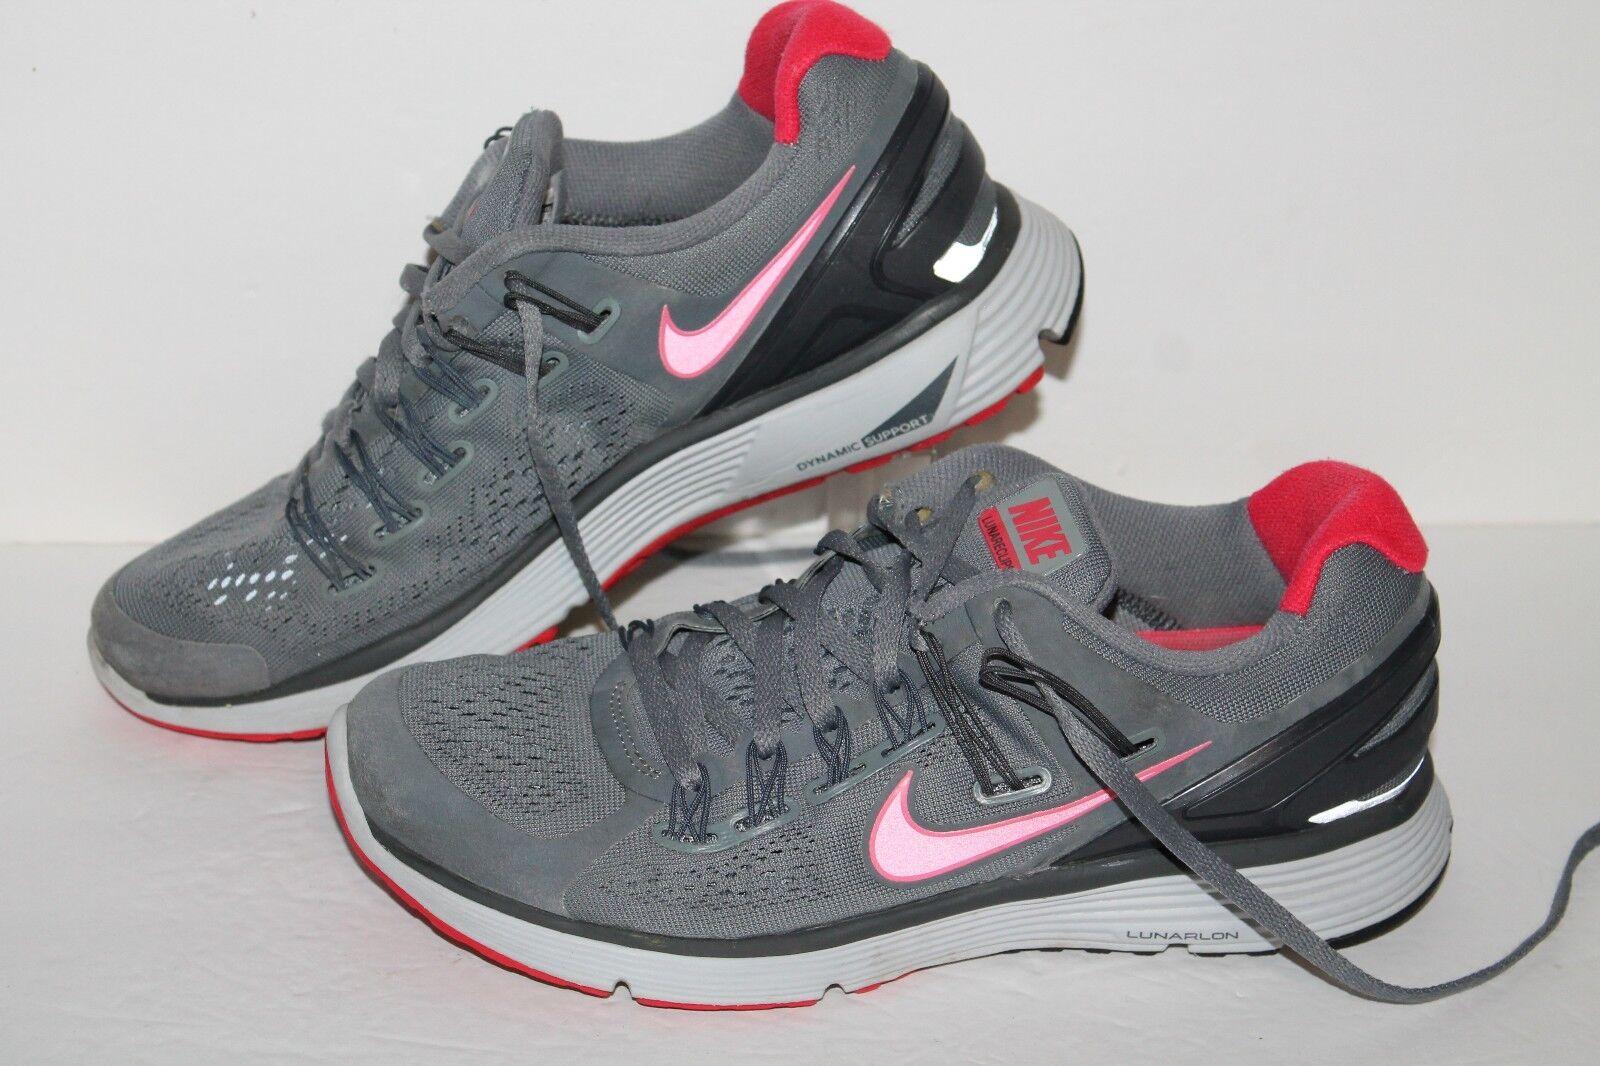 19bb804f17bf9 ... Nike Womens Lunar Eclipse 3 + Running Shoes